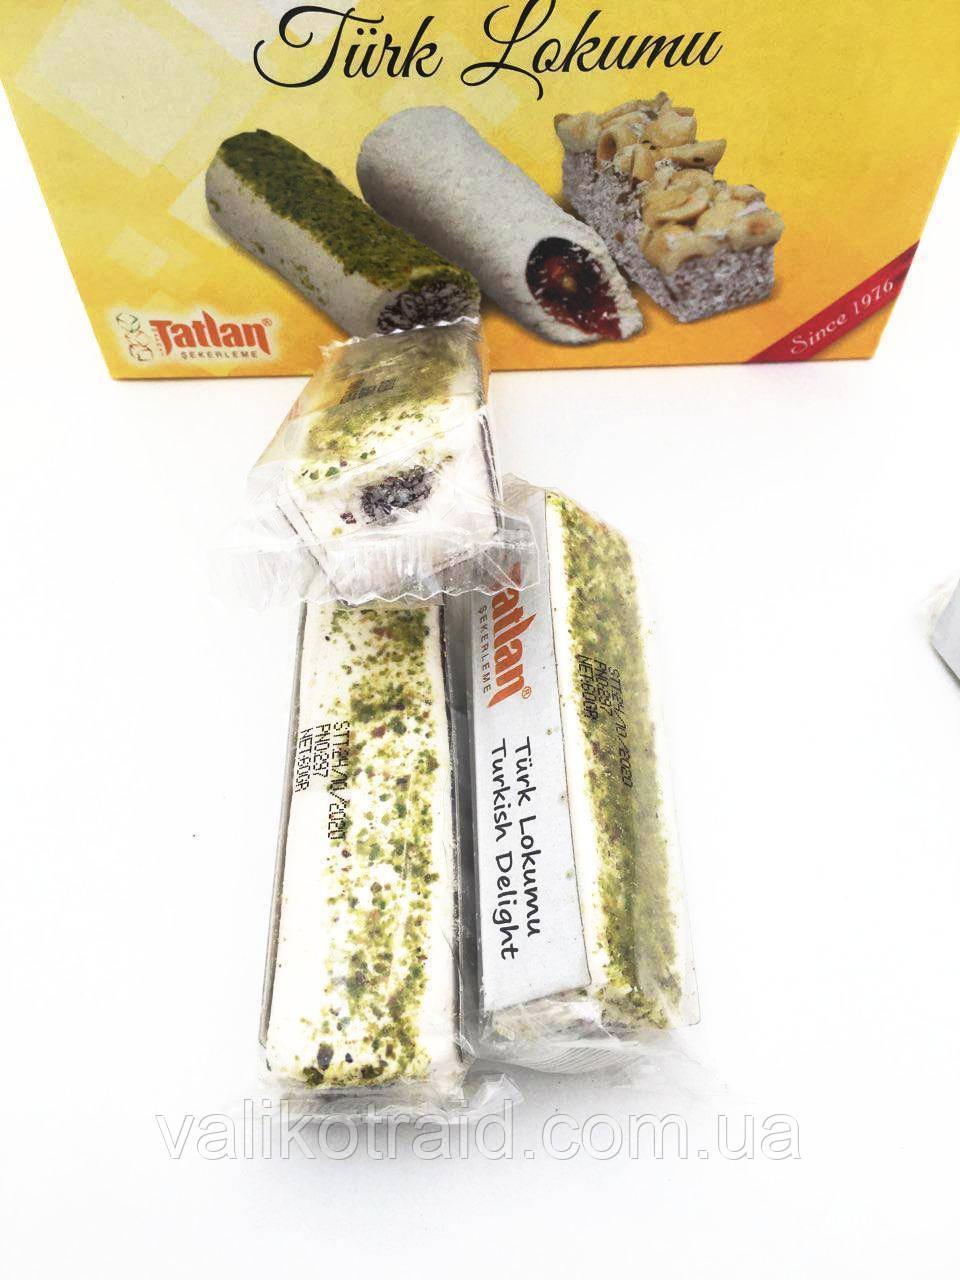 Белый лукум TATLAN (60 гр) с фруктовым мармеладом ,